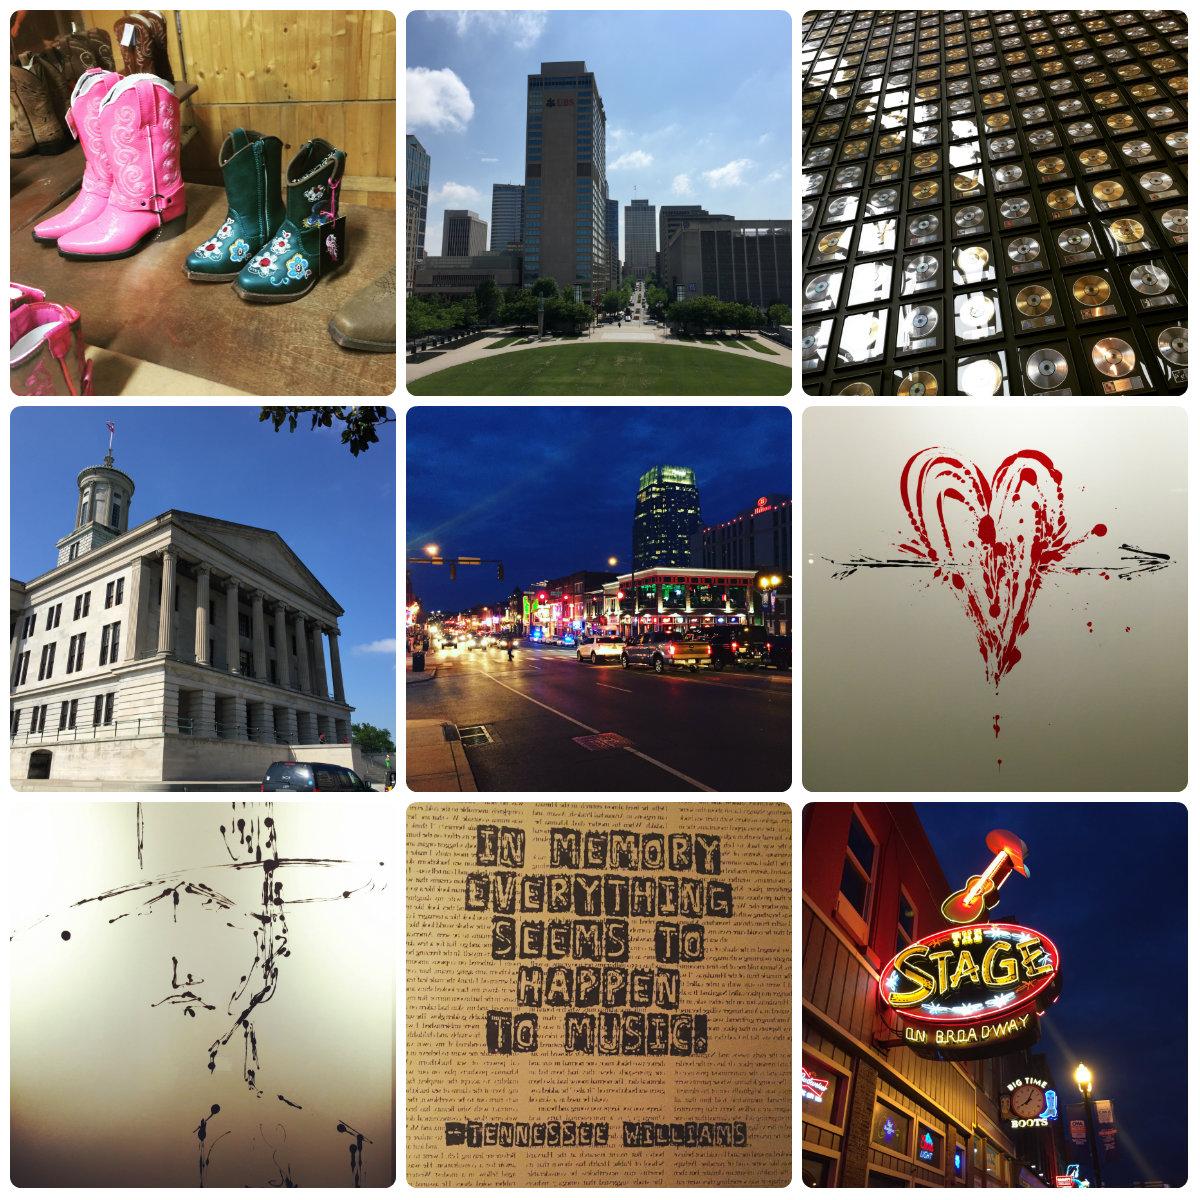 NSAA16 @ Nashville - Armelle Solelhac